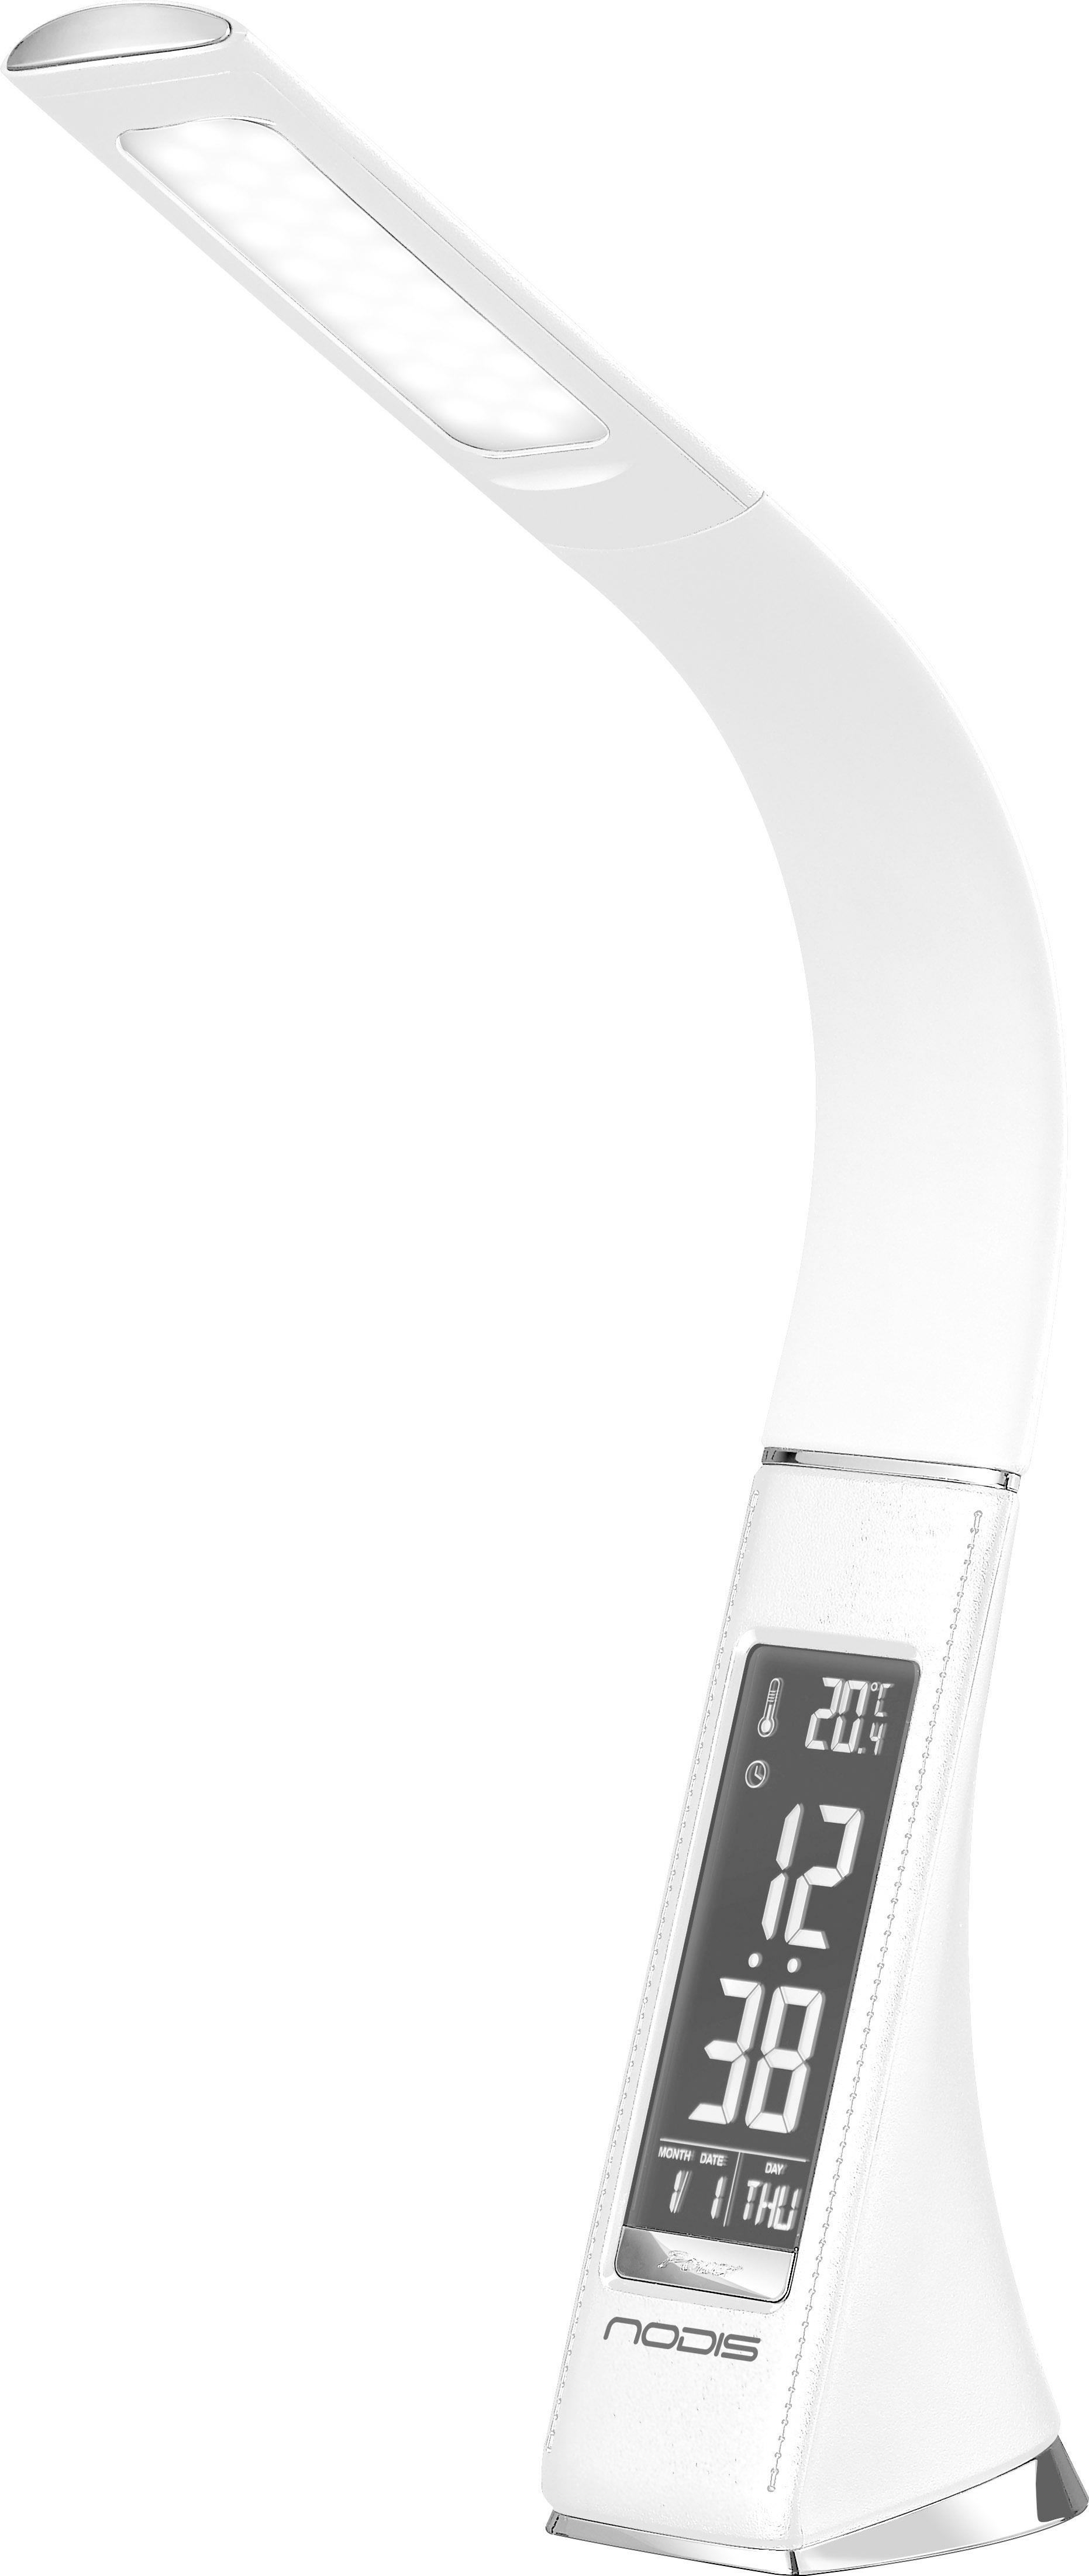 Nodis Lampada LED da tavolo 5W Luce Bianca Orologio Sveglia Calendario NT-L15